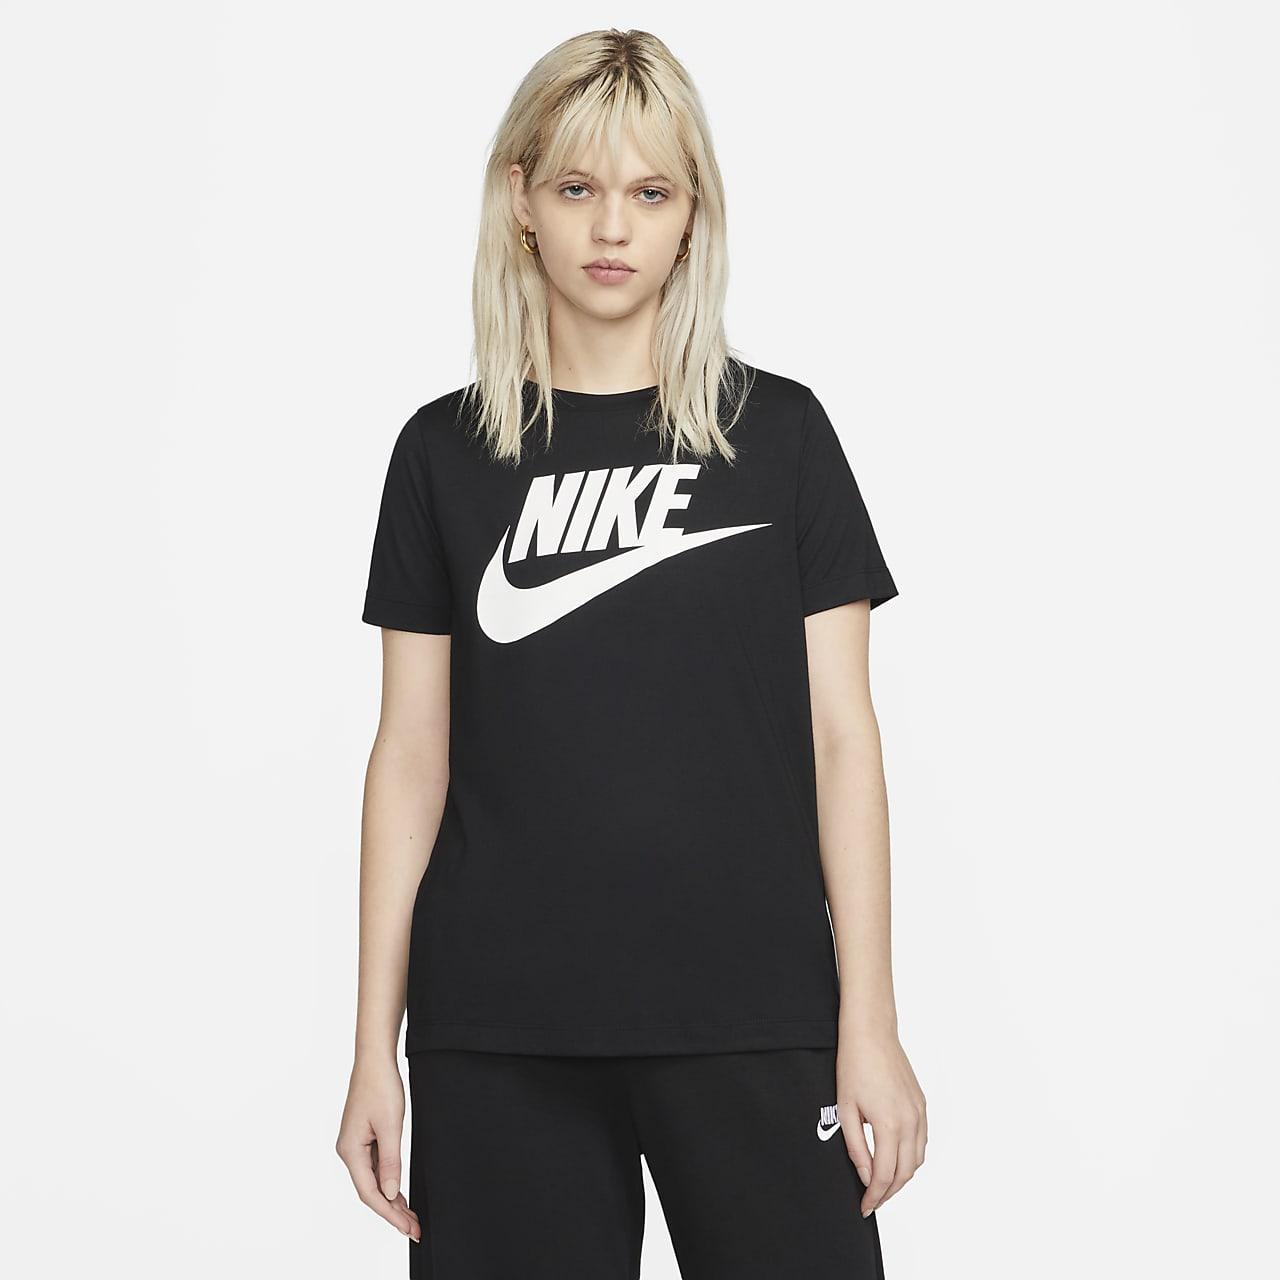 2e25823b26 Nike Sportswear Essential Women s Logo Short-Sleeve Top. Nike.com GB